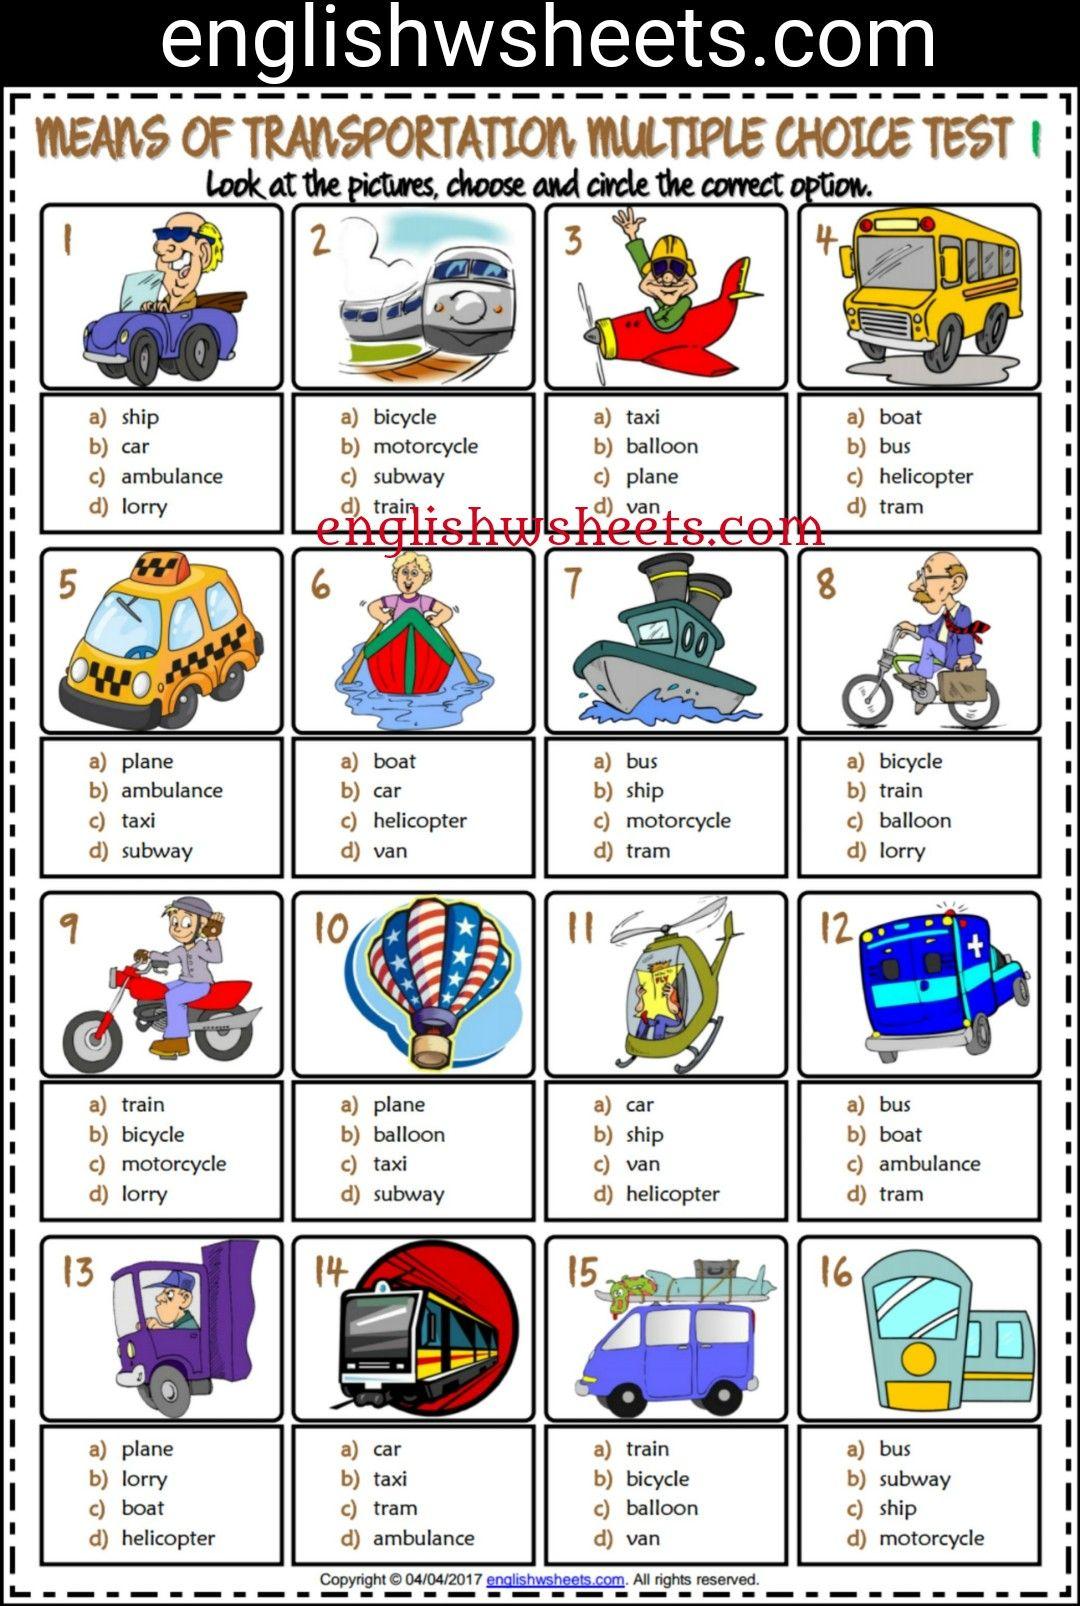 Means of Transportation Esl Printable Multiple Choice Tests For Kids ...